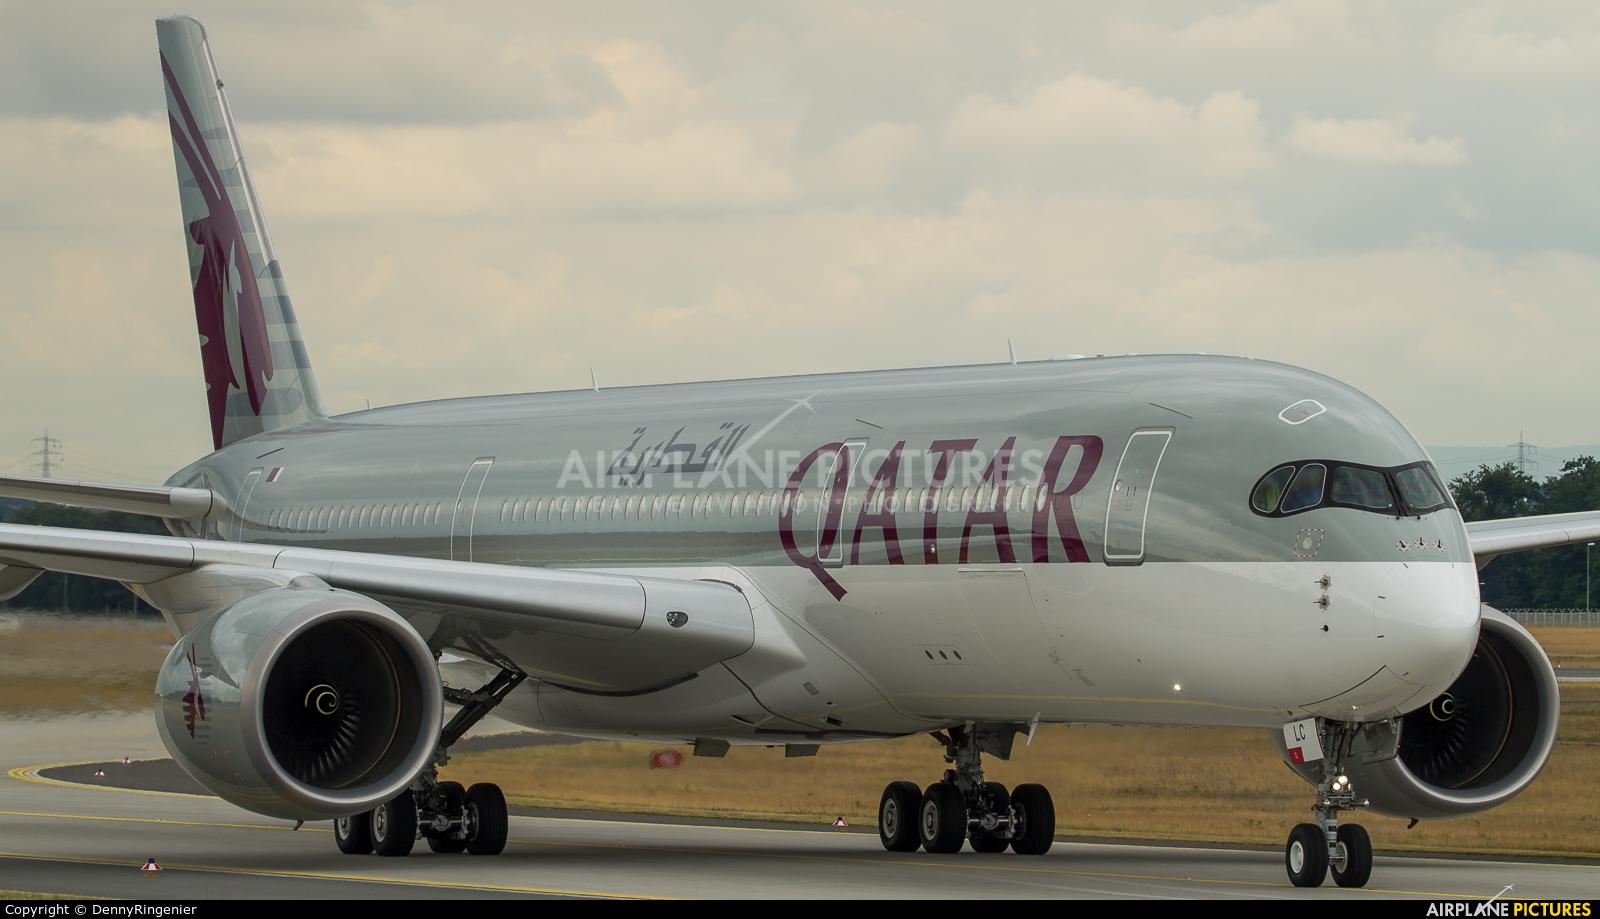 Qatar Airways A7-ALC aircraft at Frankfurt